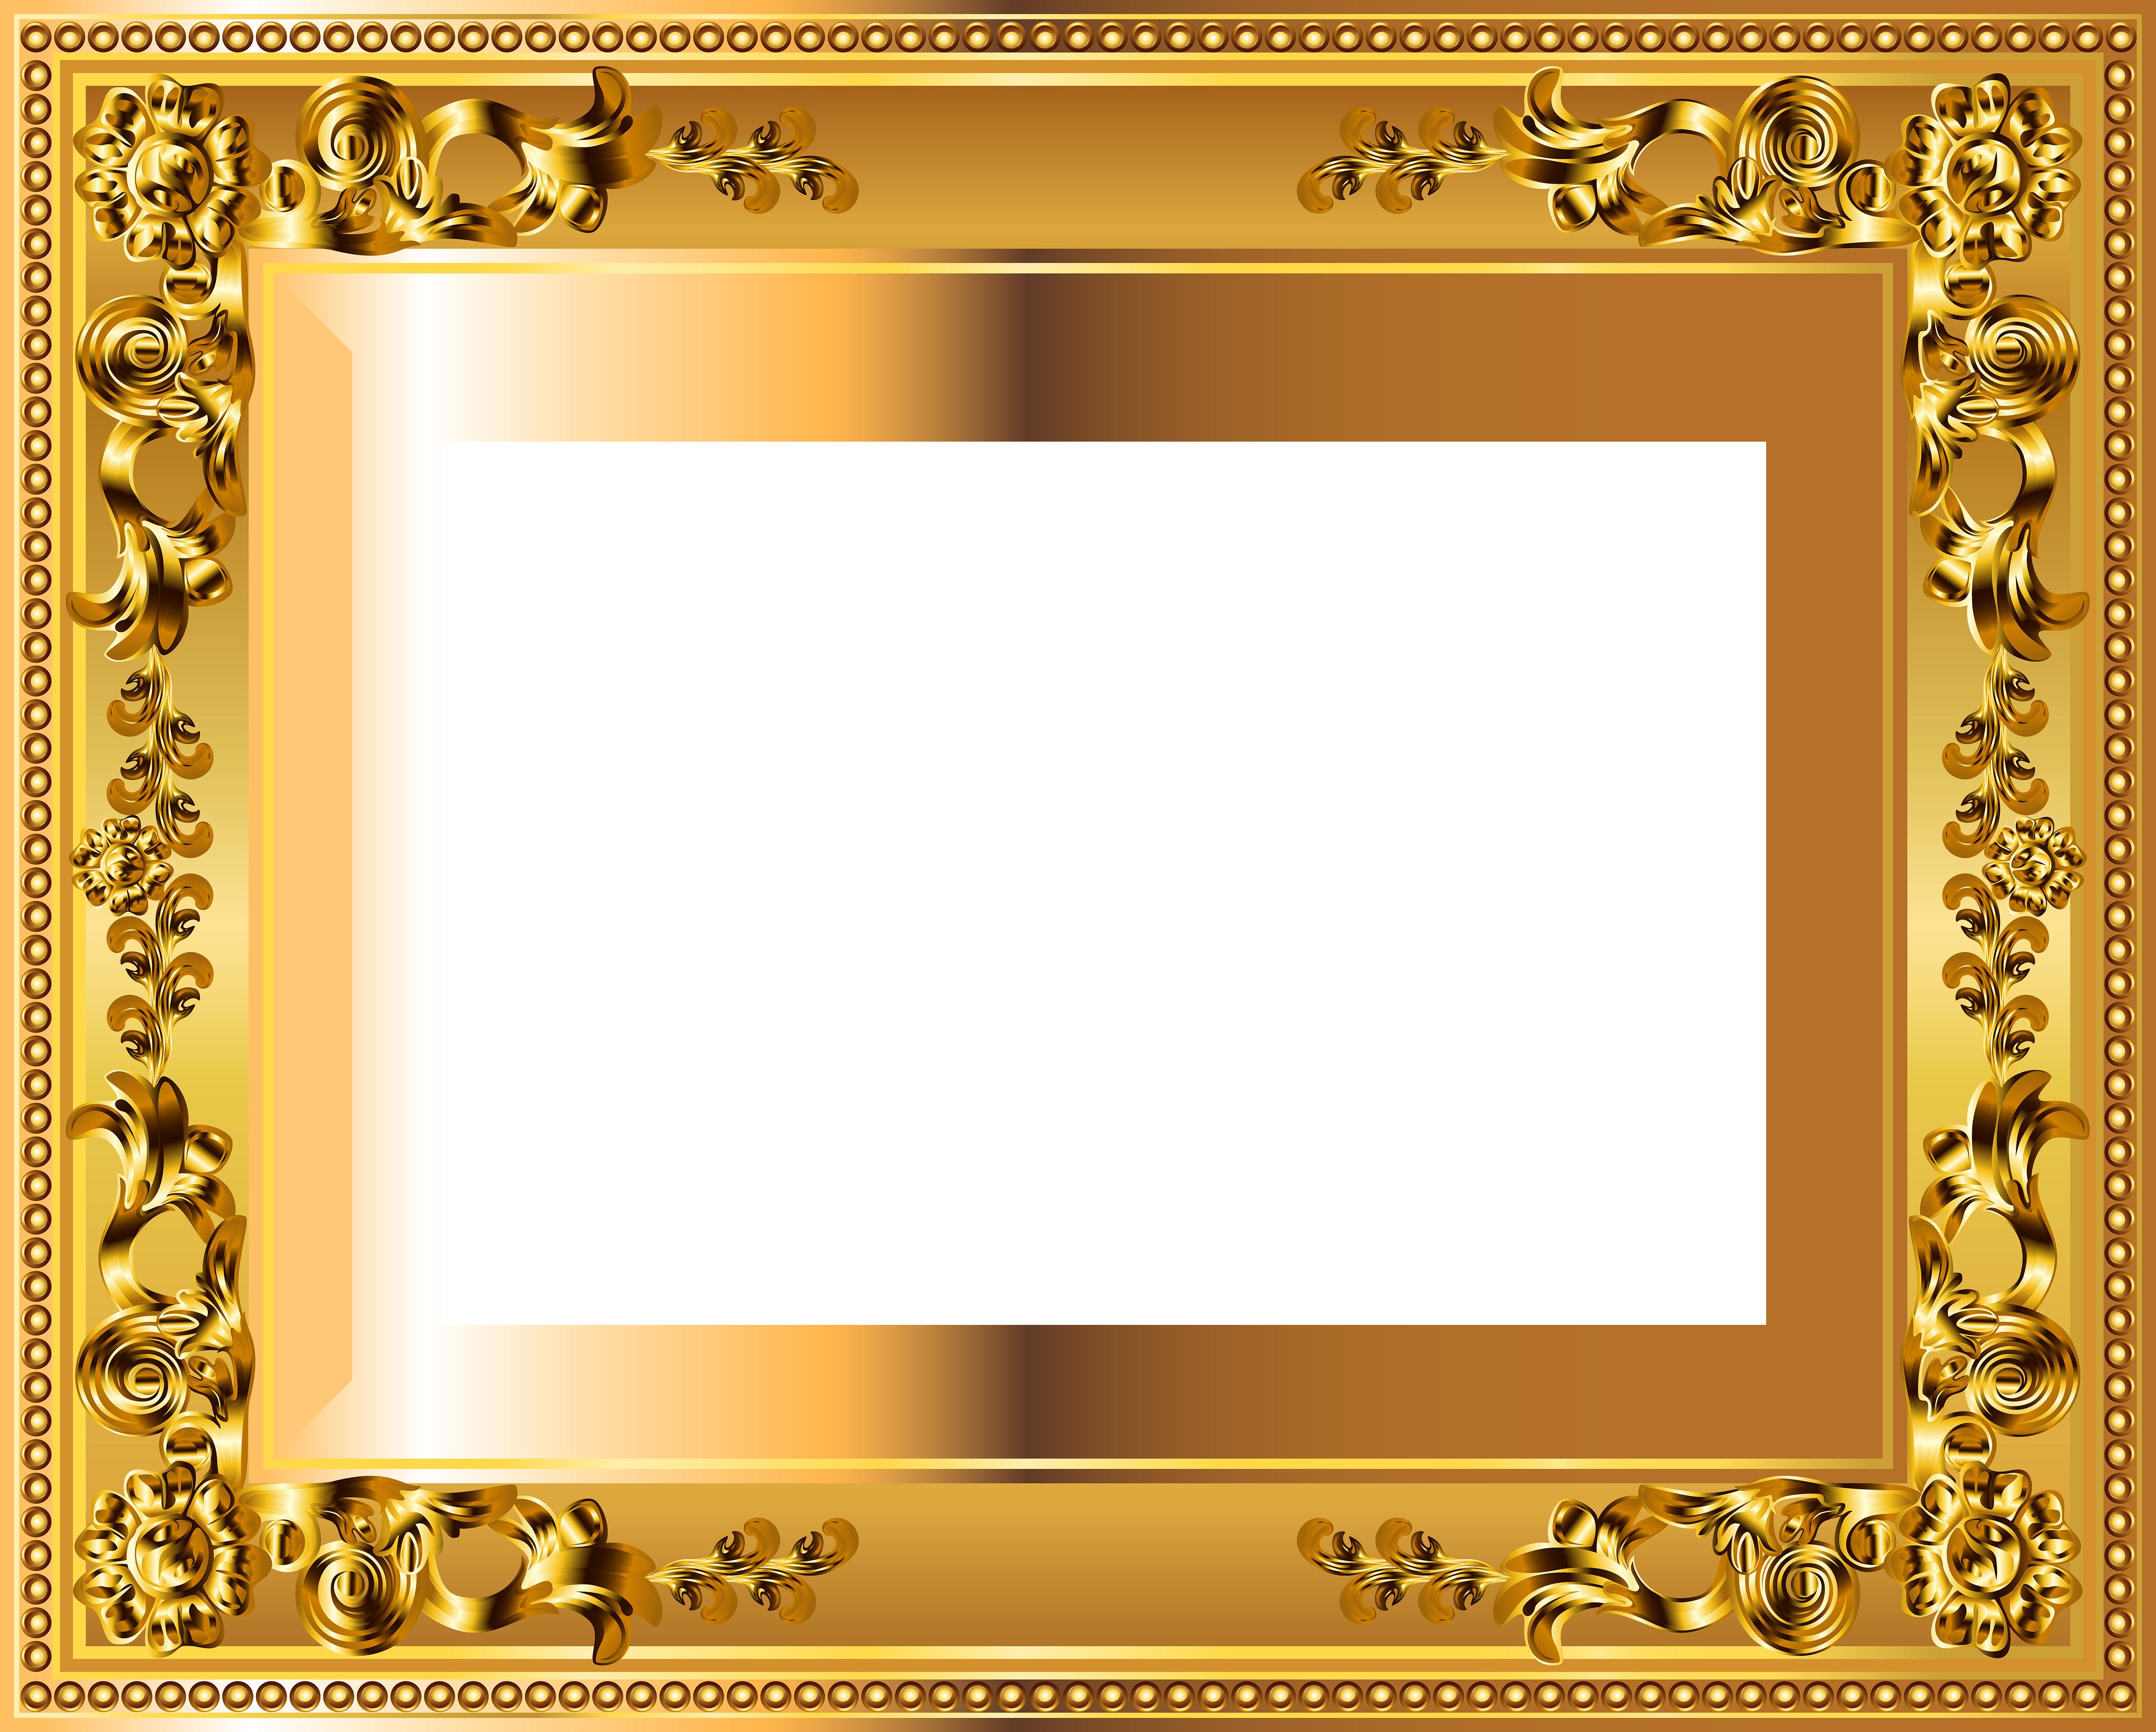 Gold Deco Border Frame Transparent Png Image Gallery Yopriceville High Quality Images And Transparent Png Free Clip Frame Picture Frame Designs Gold Frame